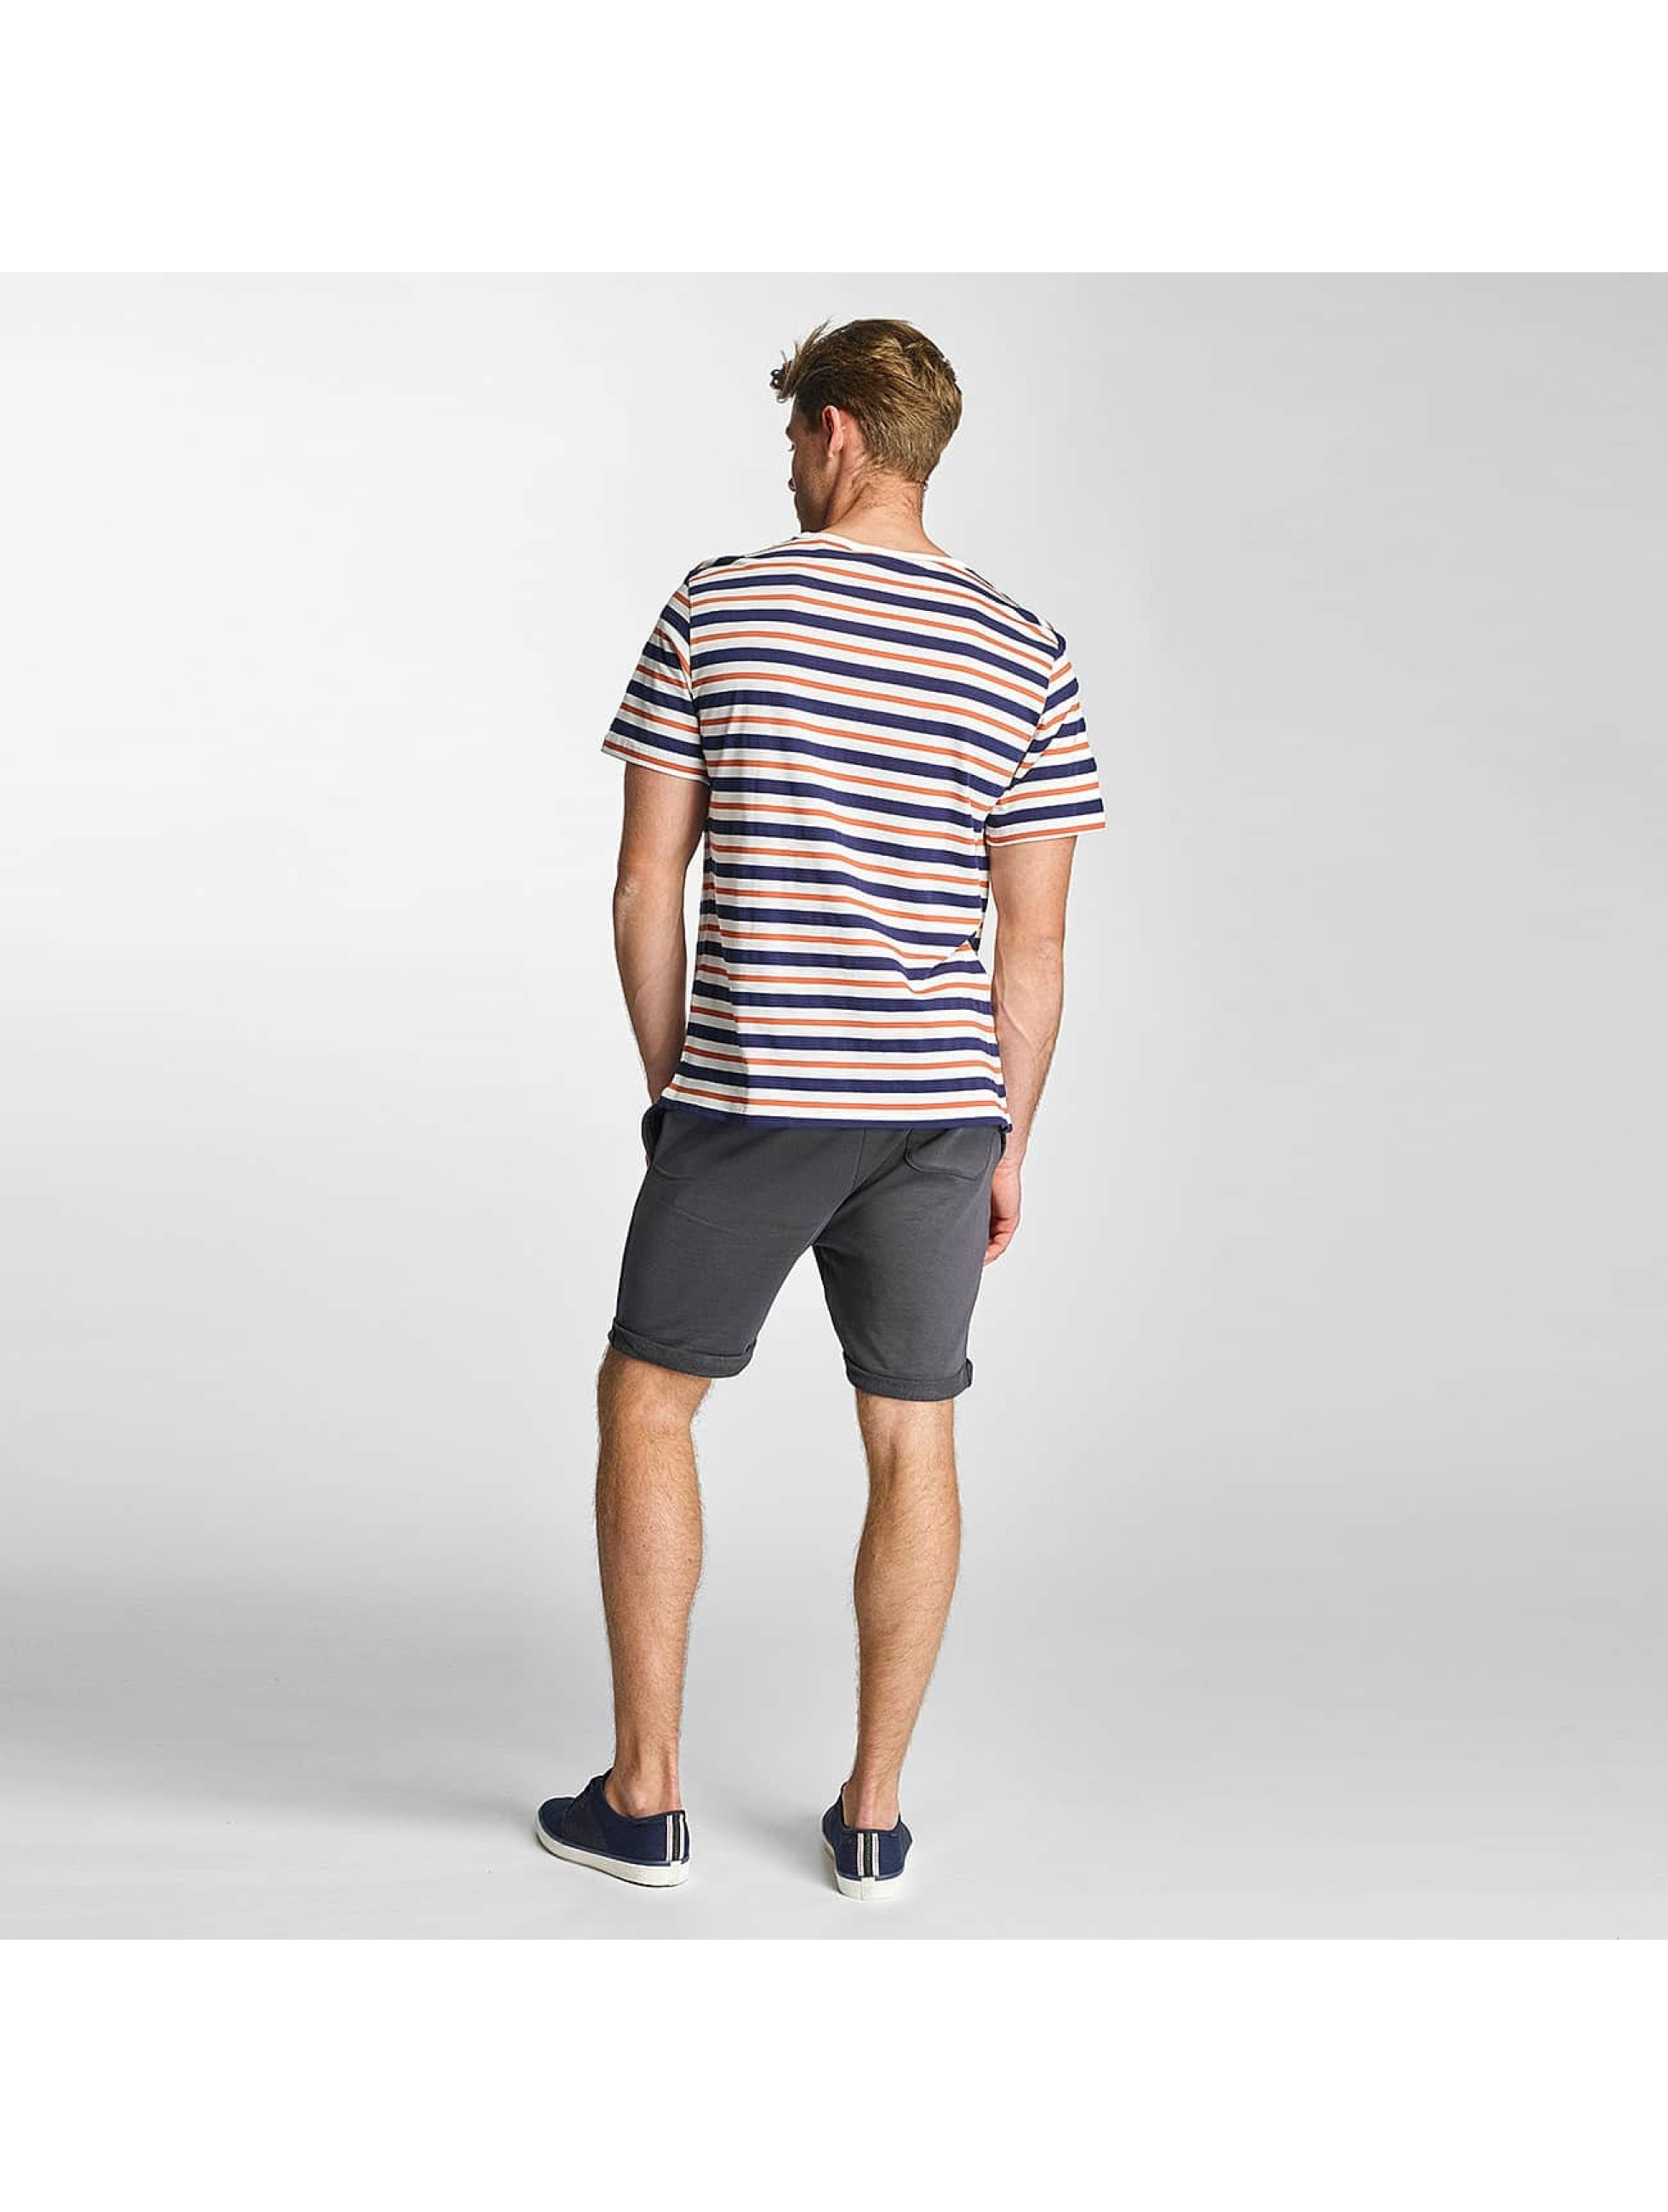 Lee T-Shirt Stripe blanc